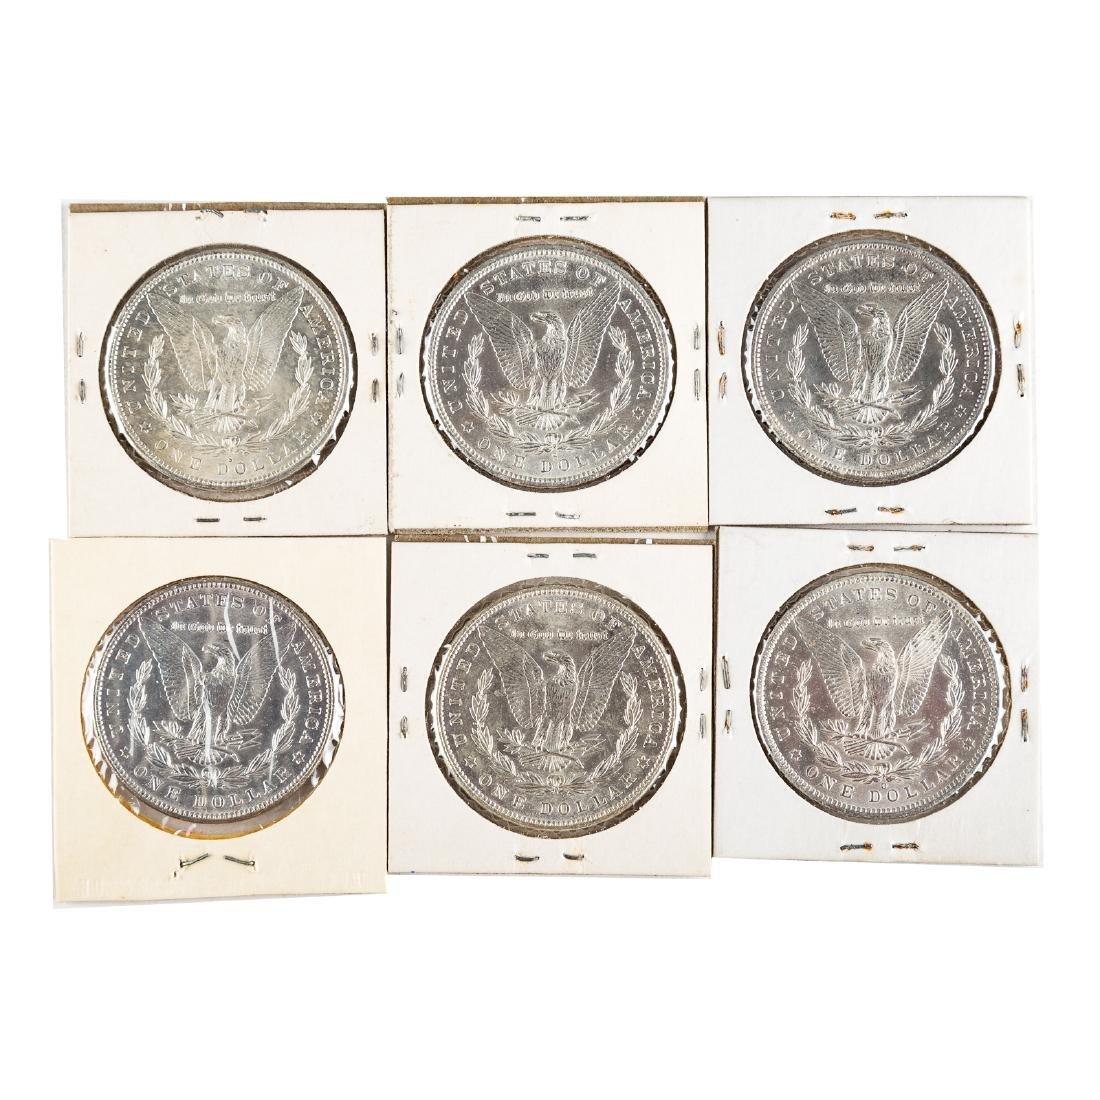 [US] Six Uncirculated Morgan Dollars - 2